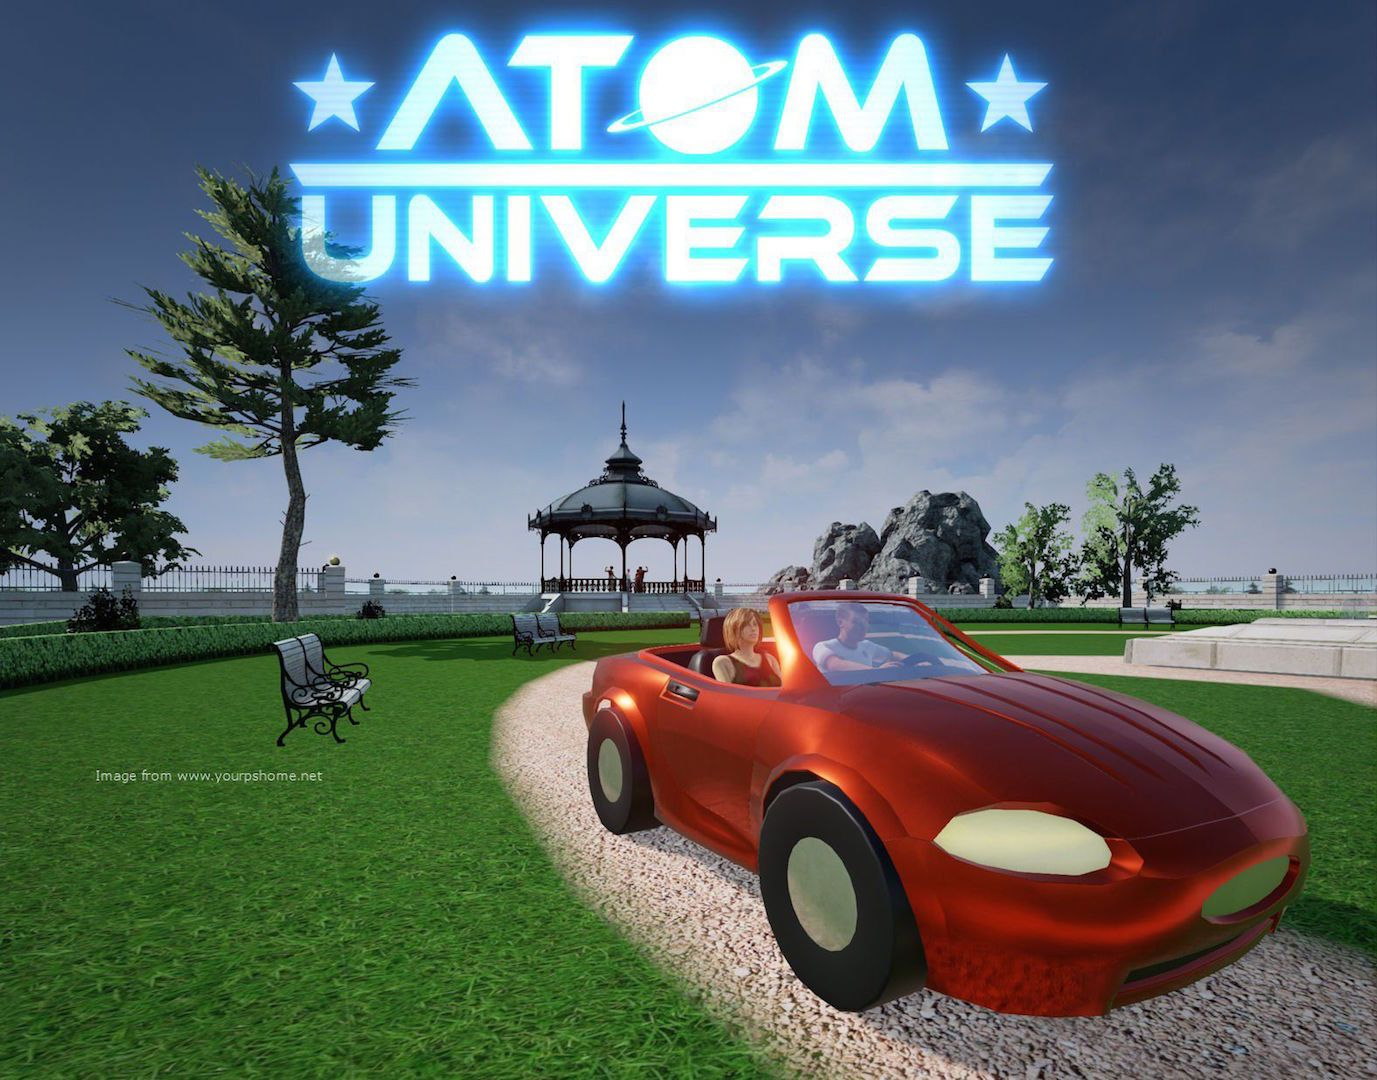 Karen Talks To Atom Republic About Atom Universe, kwoman32, Nov 30, 2014, 4:55 PM, YourPSHome.net, jpg, SportsCar-copy.jpg